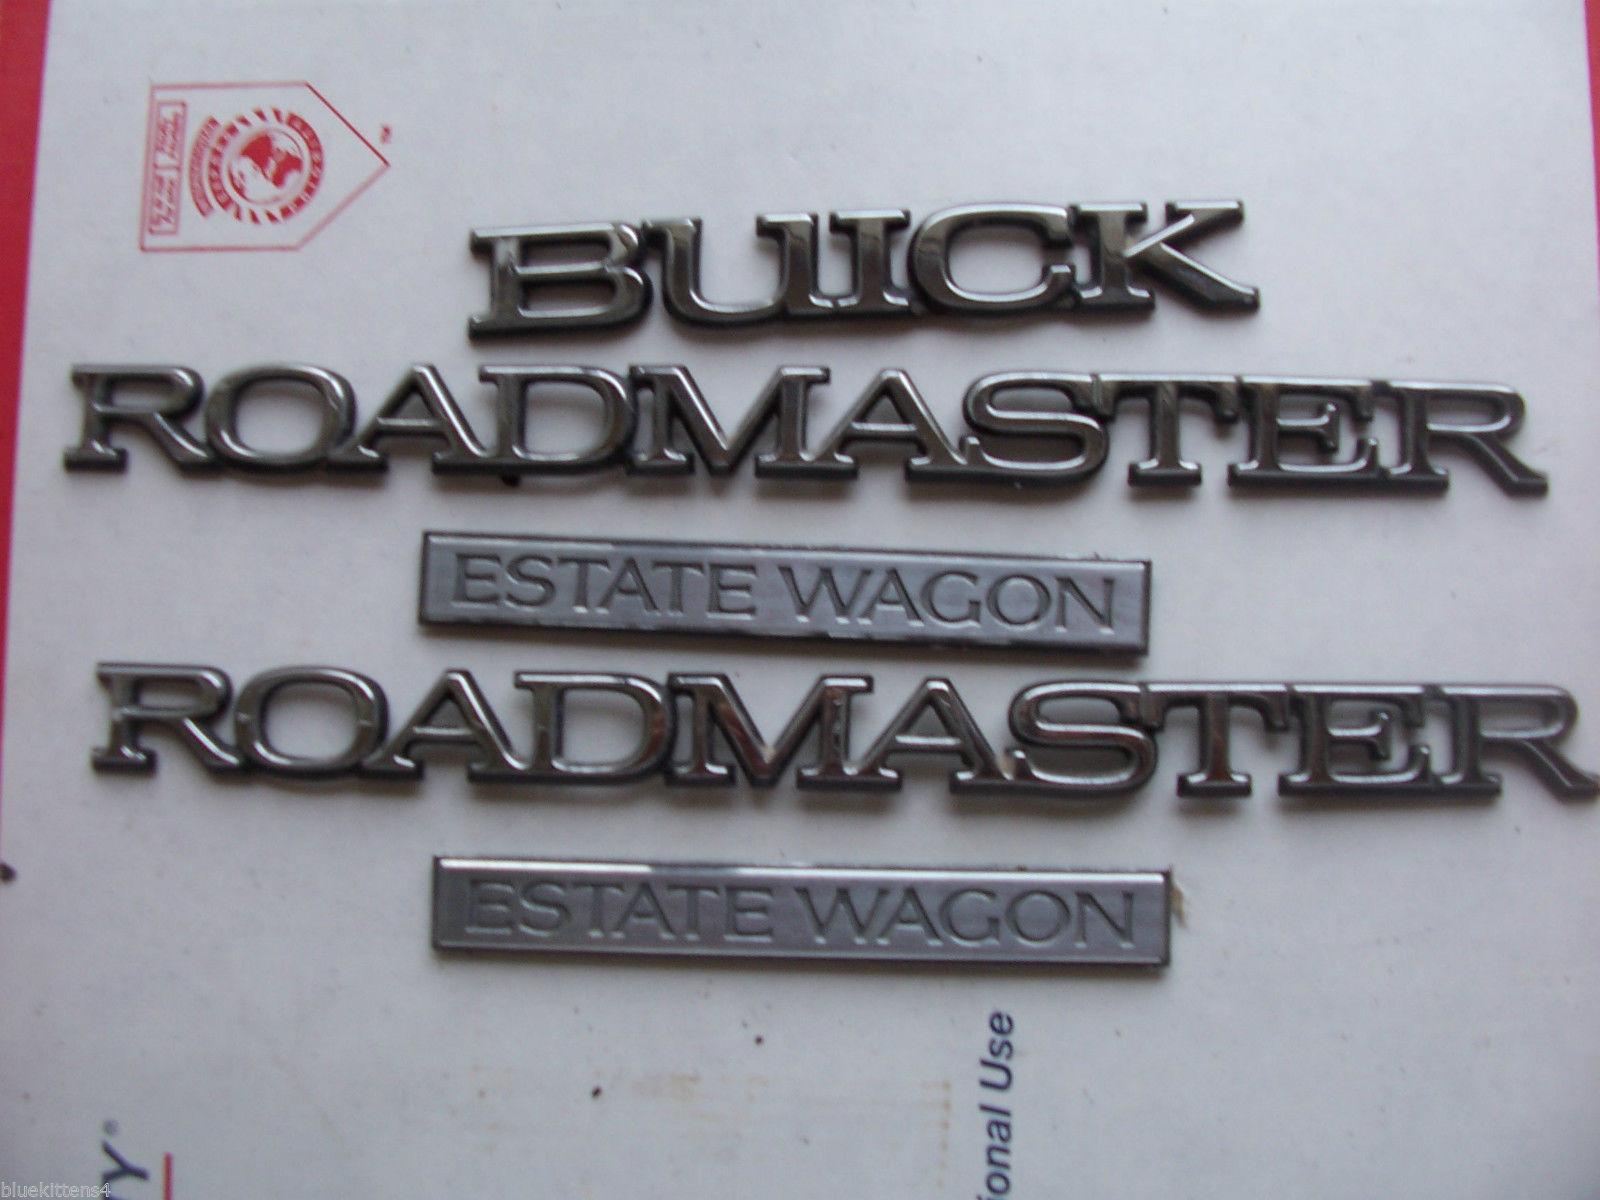 1996 ROADMASTER ESTATE WAGON SIDE & REAR 5 TRIM EMBLEM S OEM USED ORIG 1995 1994